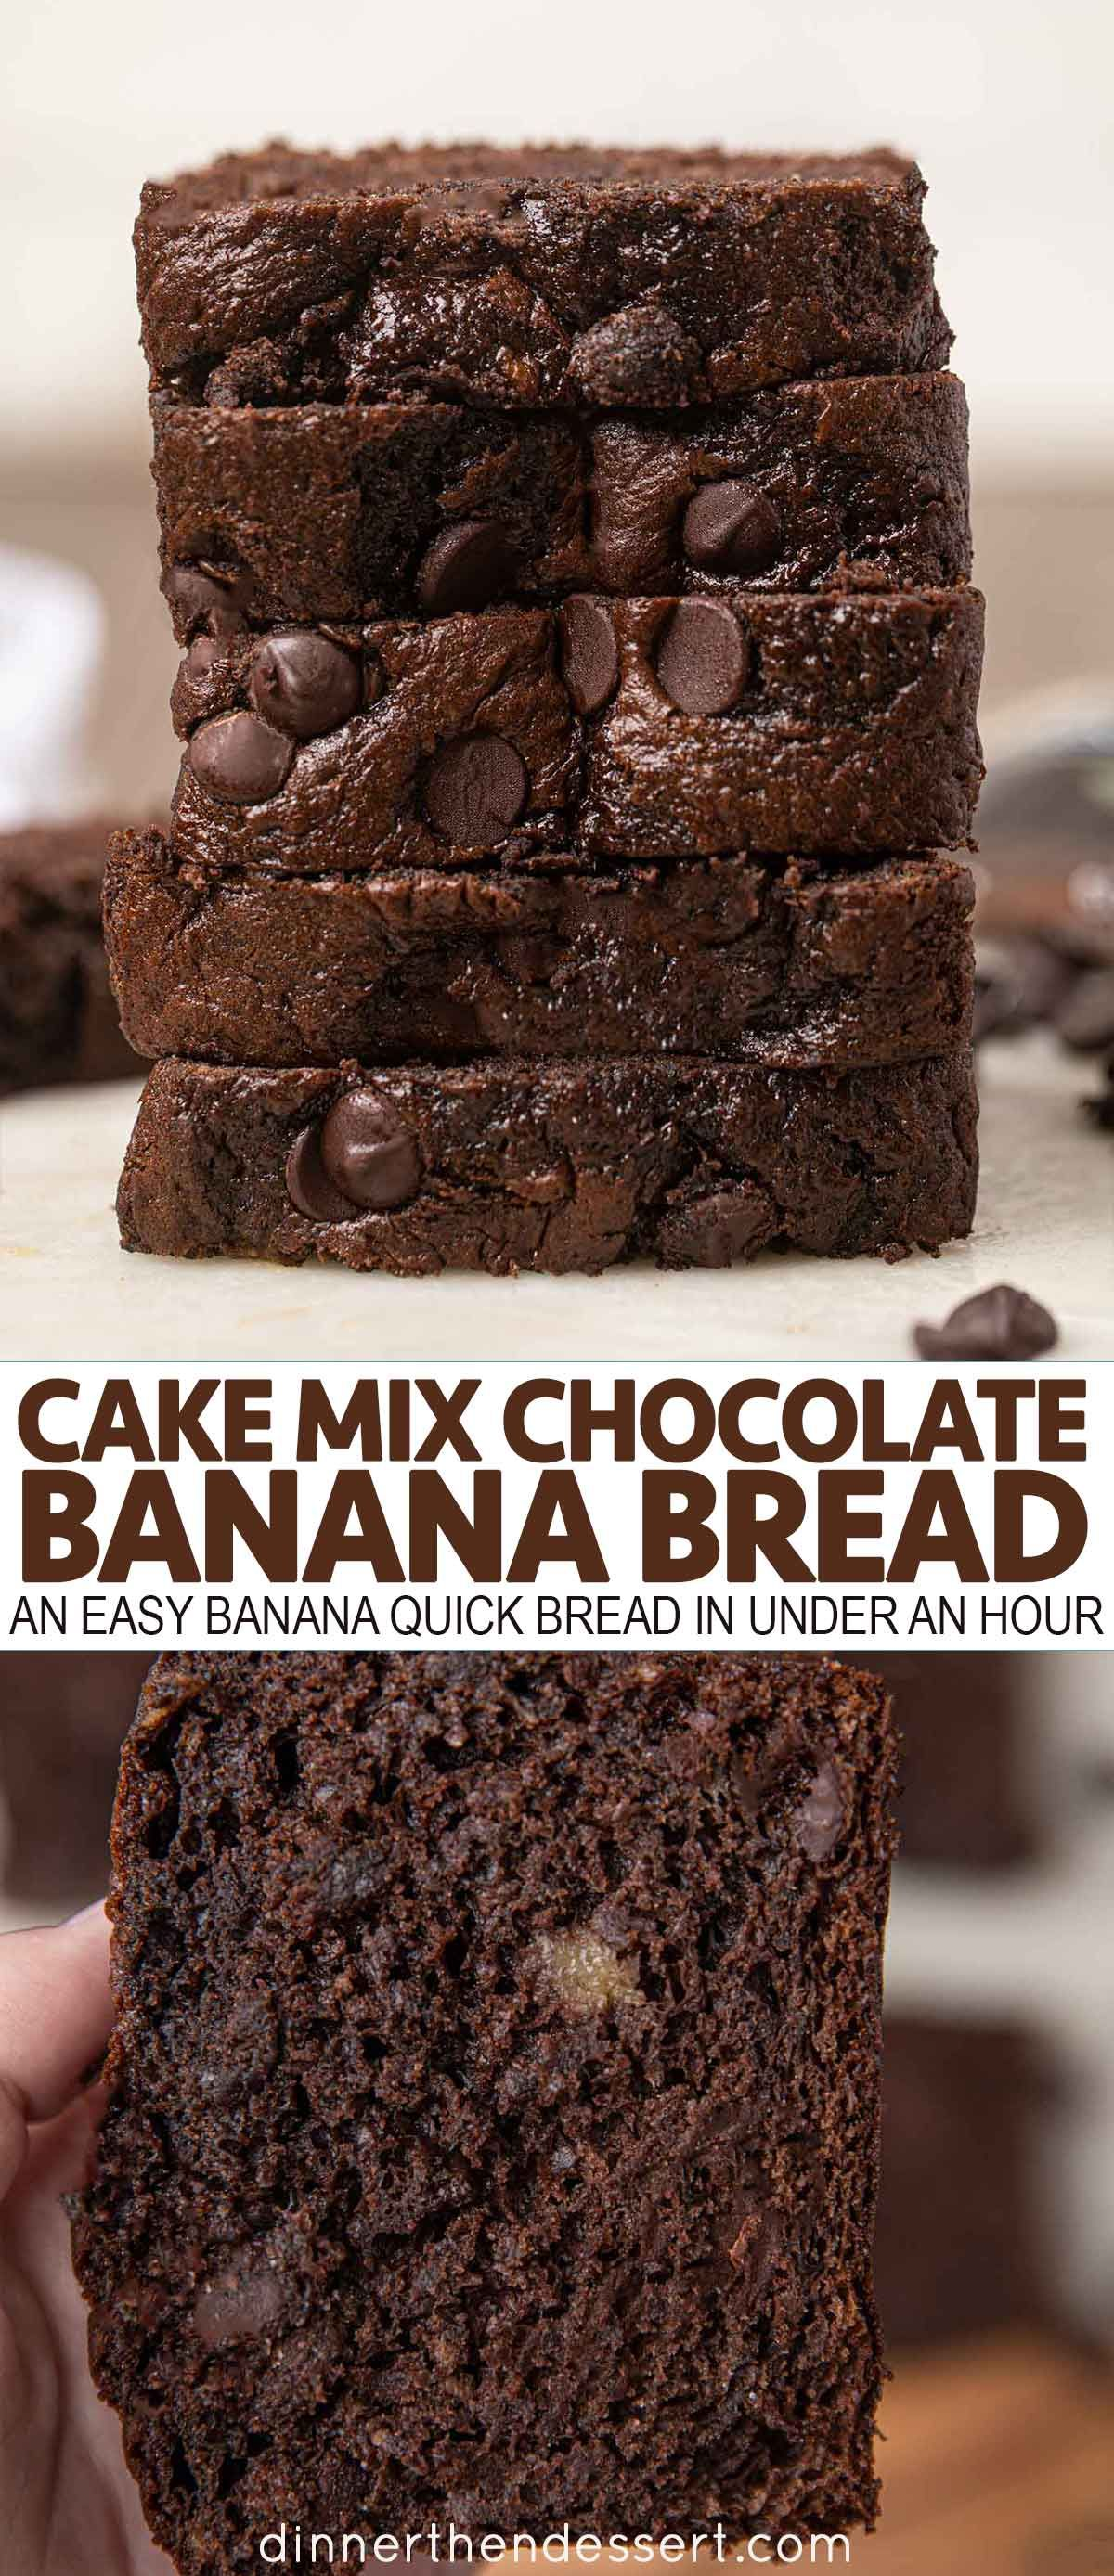 Cake mix chocolate banana bread is an easy banana quick